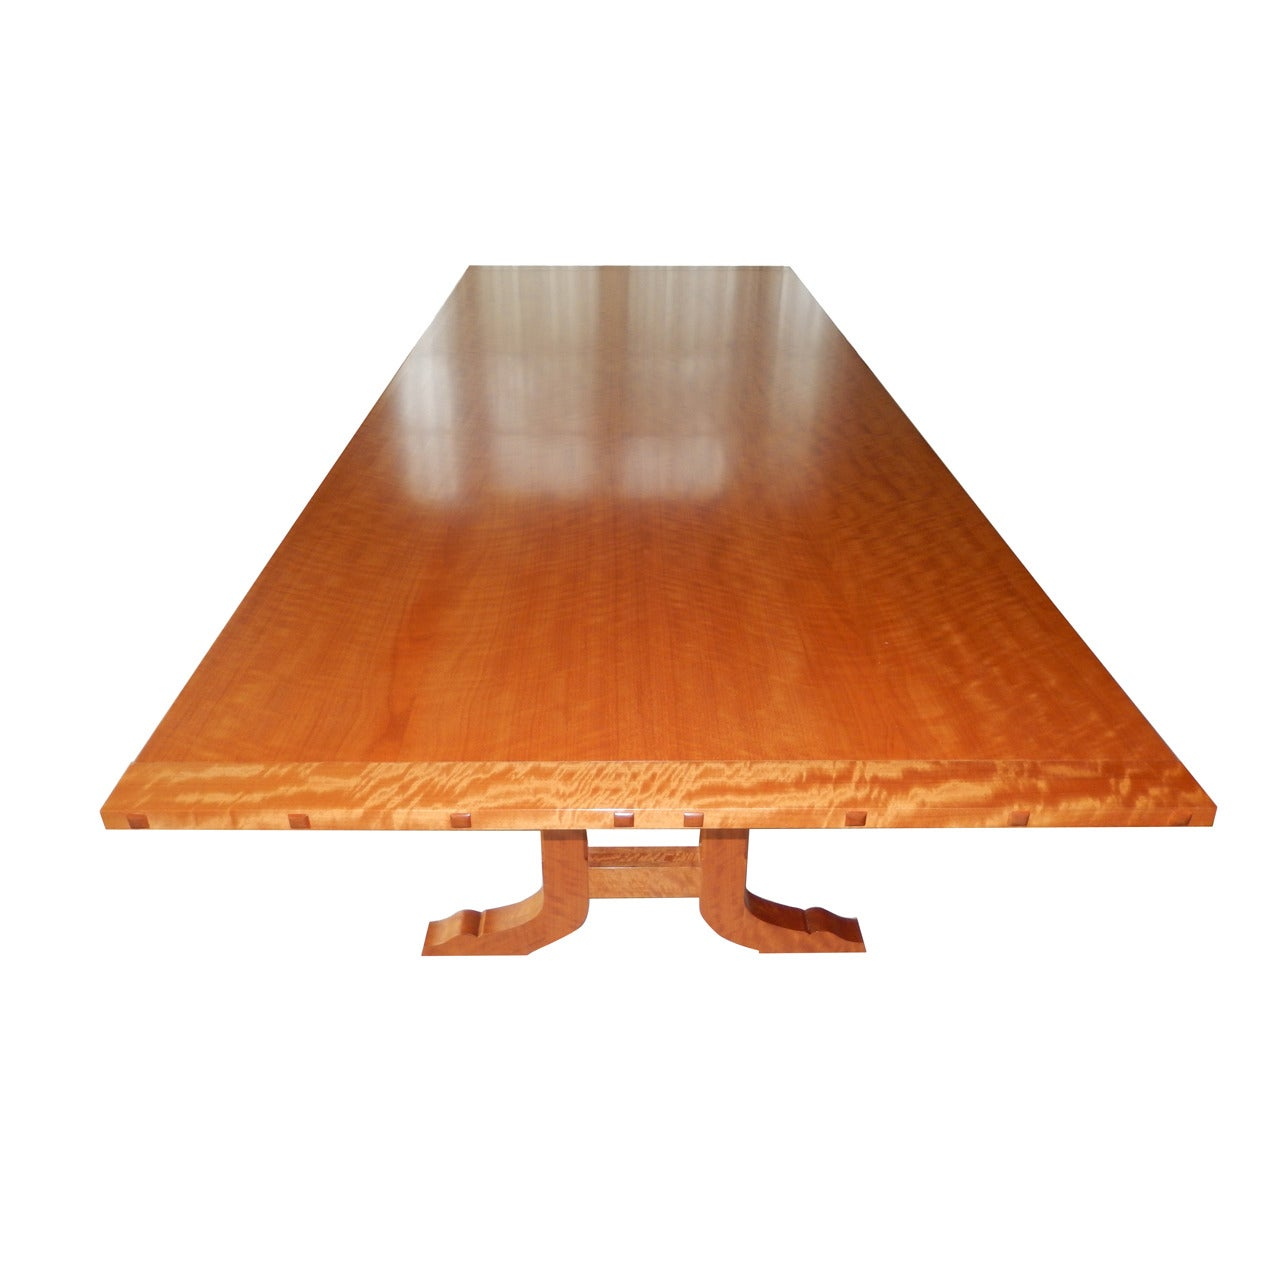 David N. Ebner Makore Wood Dining Room or Conference Table,